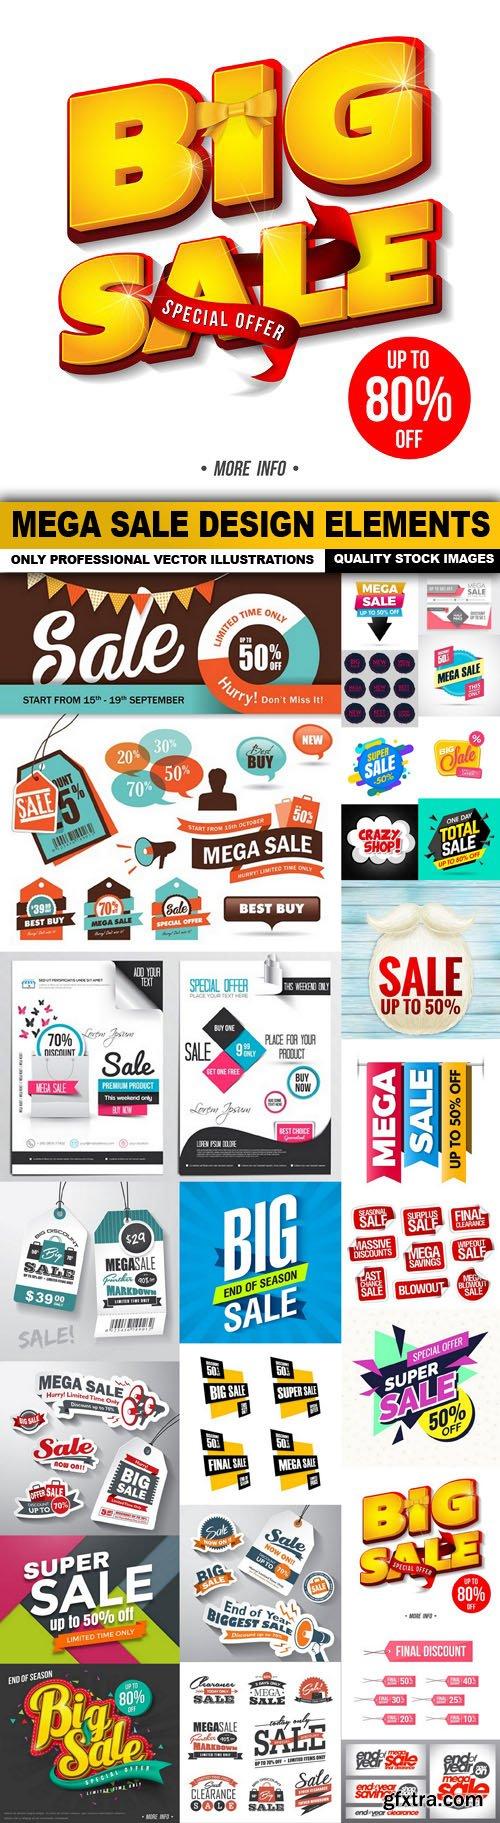 Mega Sale Design Elements - 25 Vector